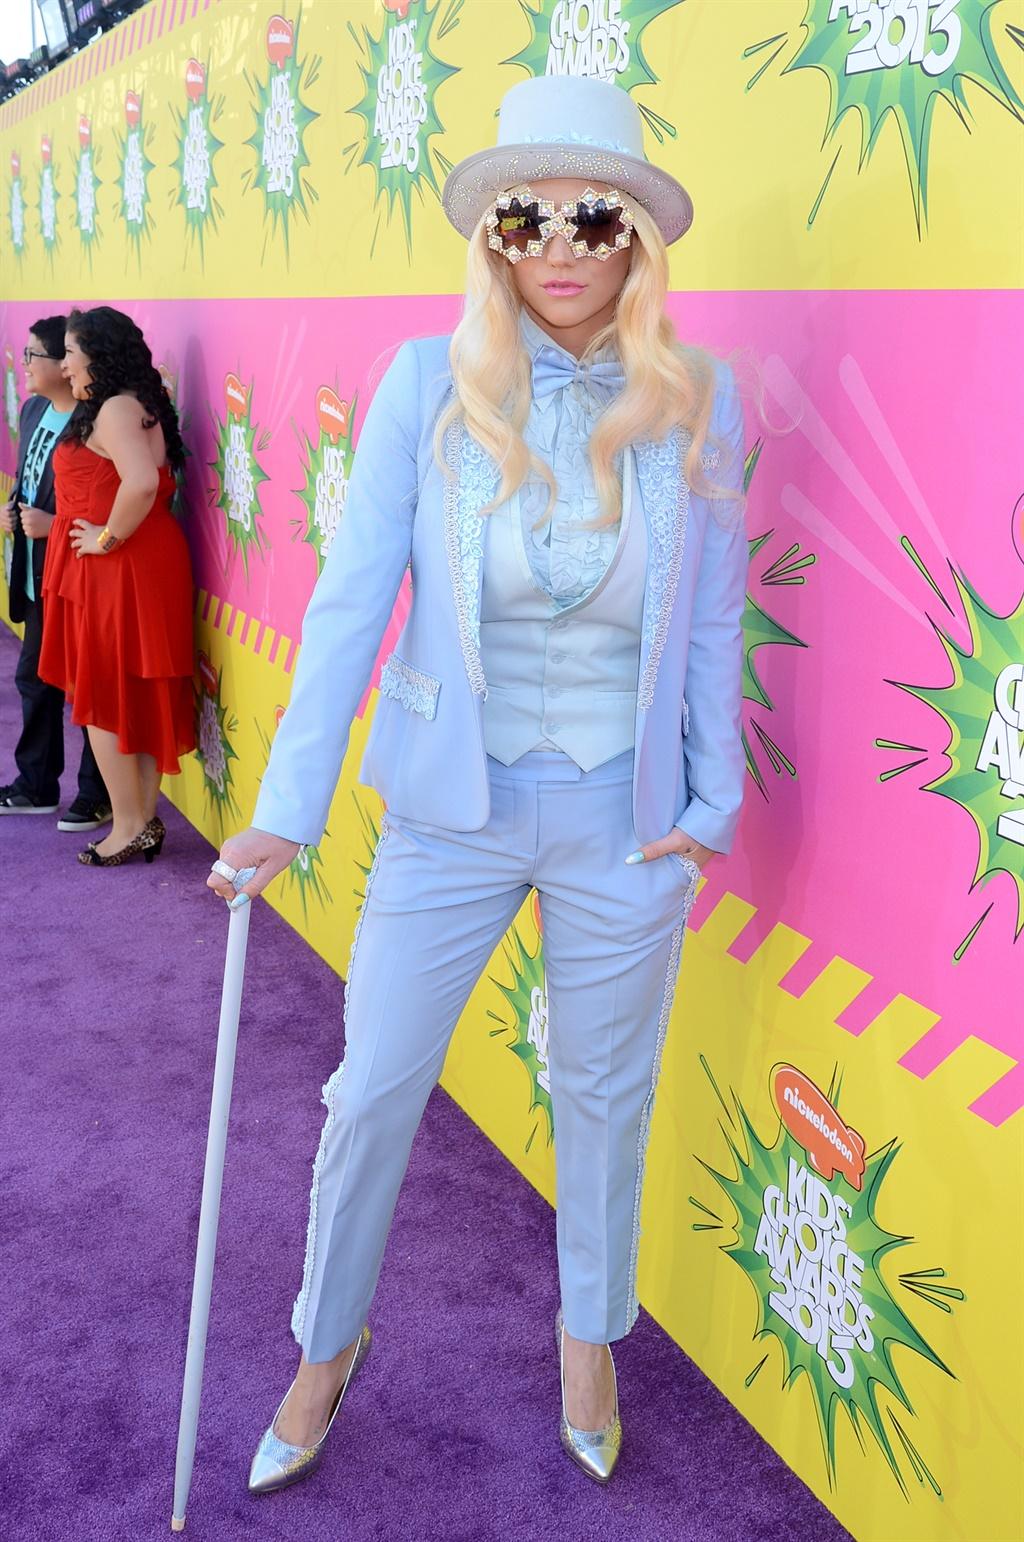 LOS ANGELES, CA - MARCH 23: Ke$ha arrives at Nick